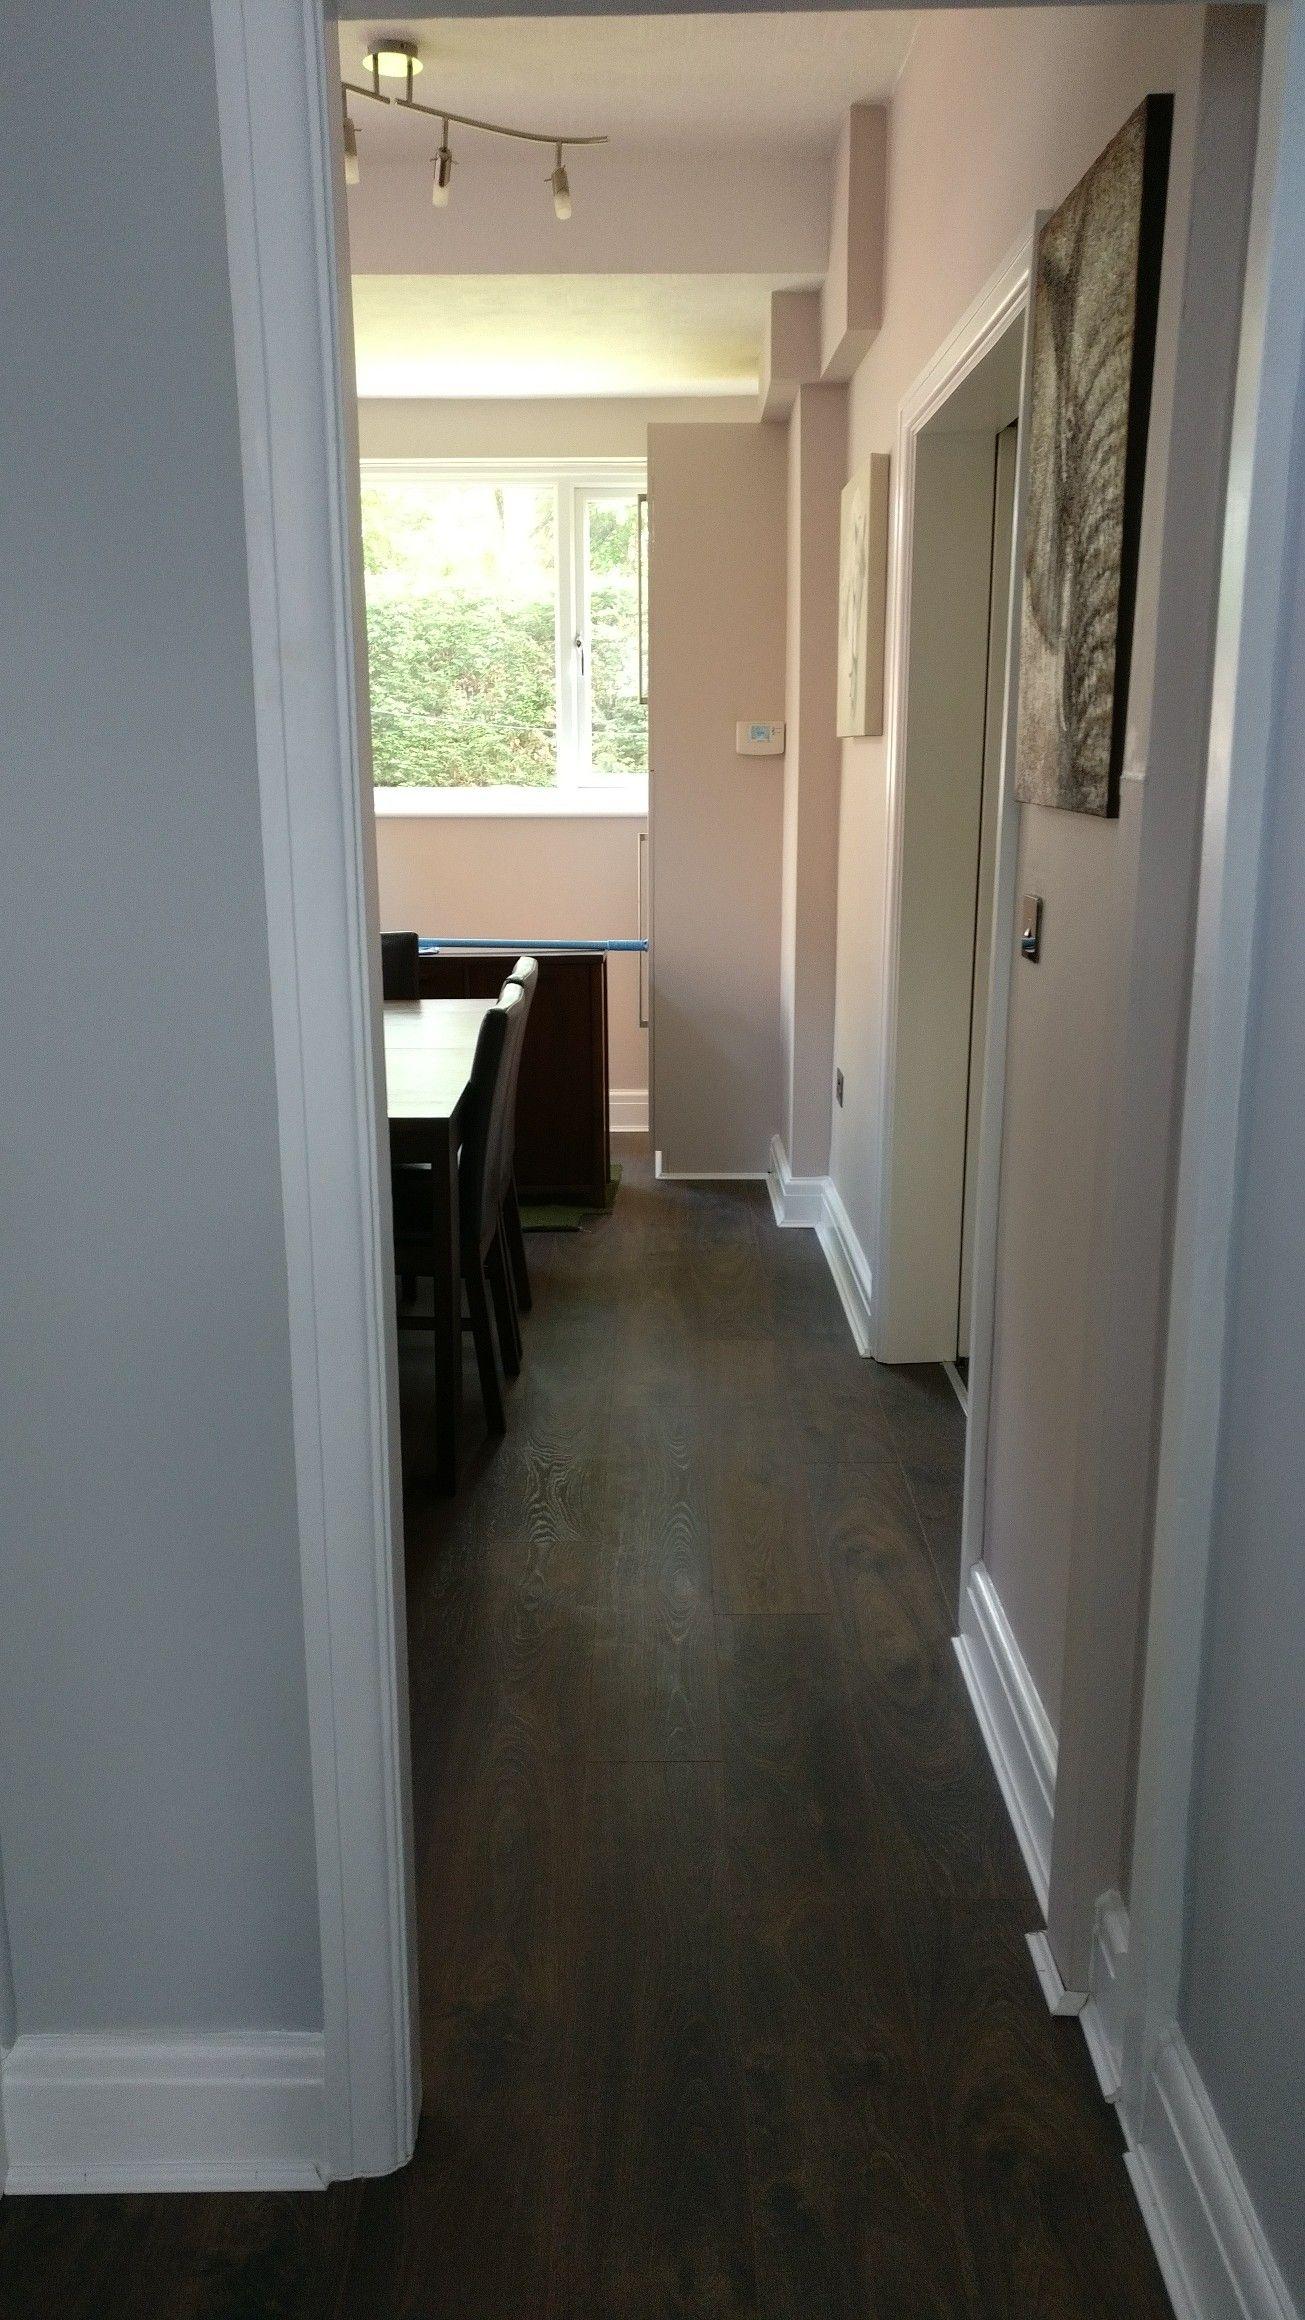 hallway leading to dining room hallway wall paint. Black Bedroom Furniture Sets. Home Design Ideas